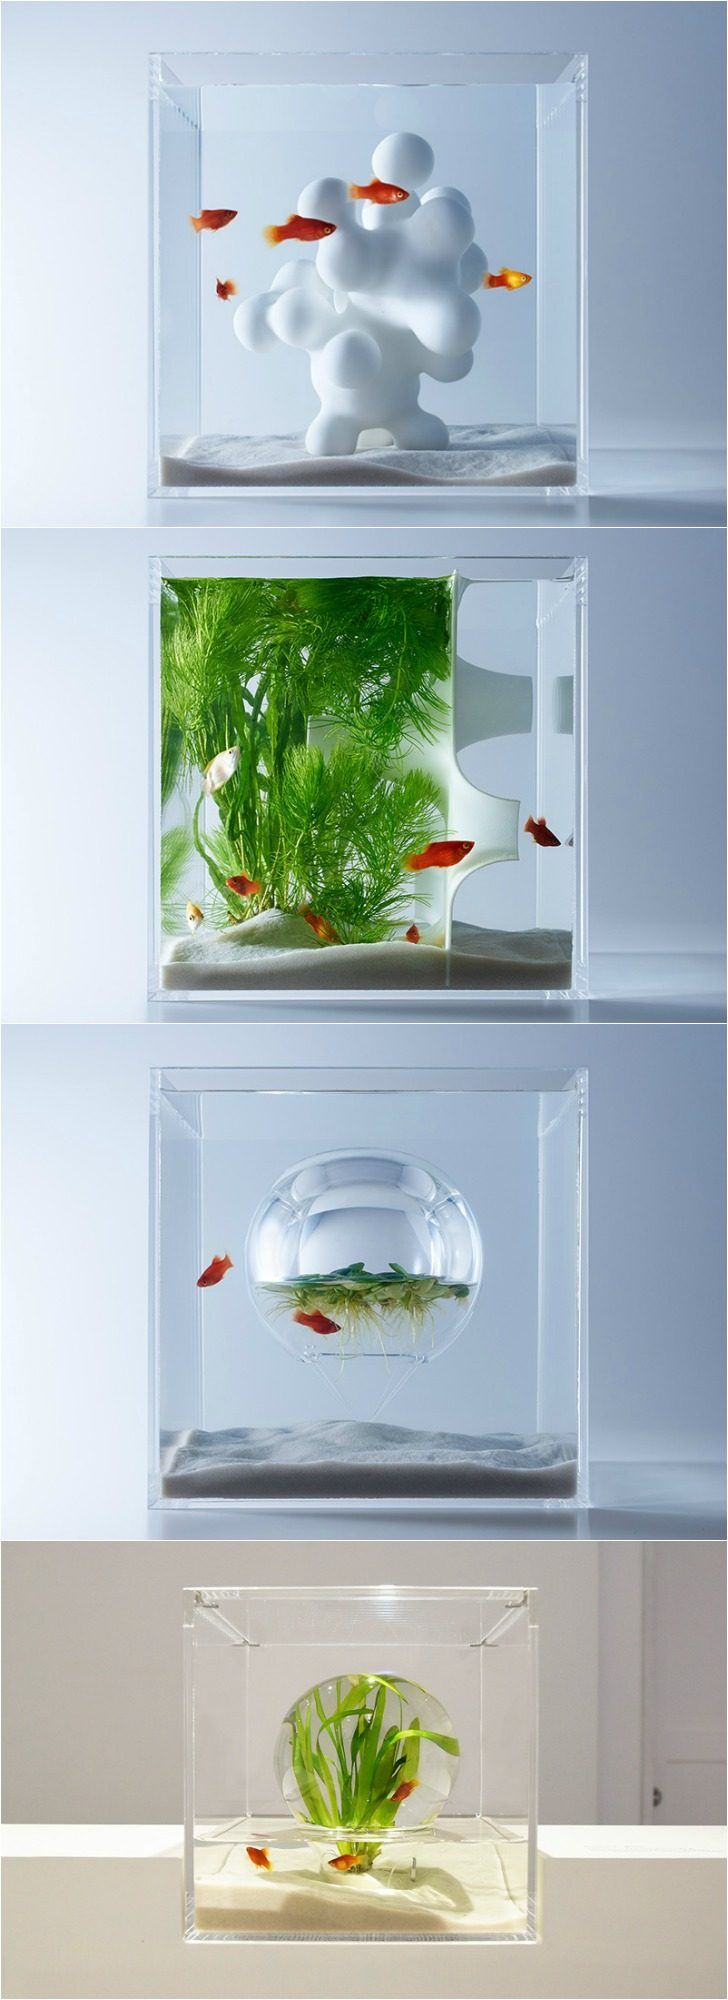 Fish tank toilet - Fish Tank Toilet